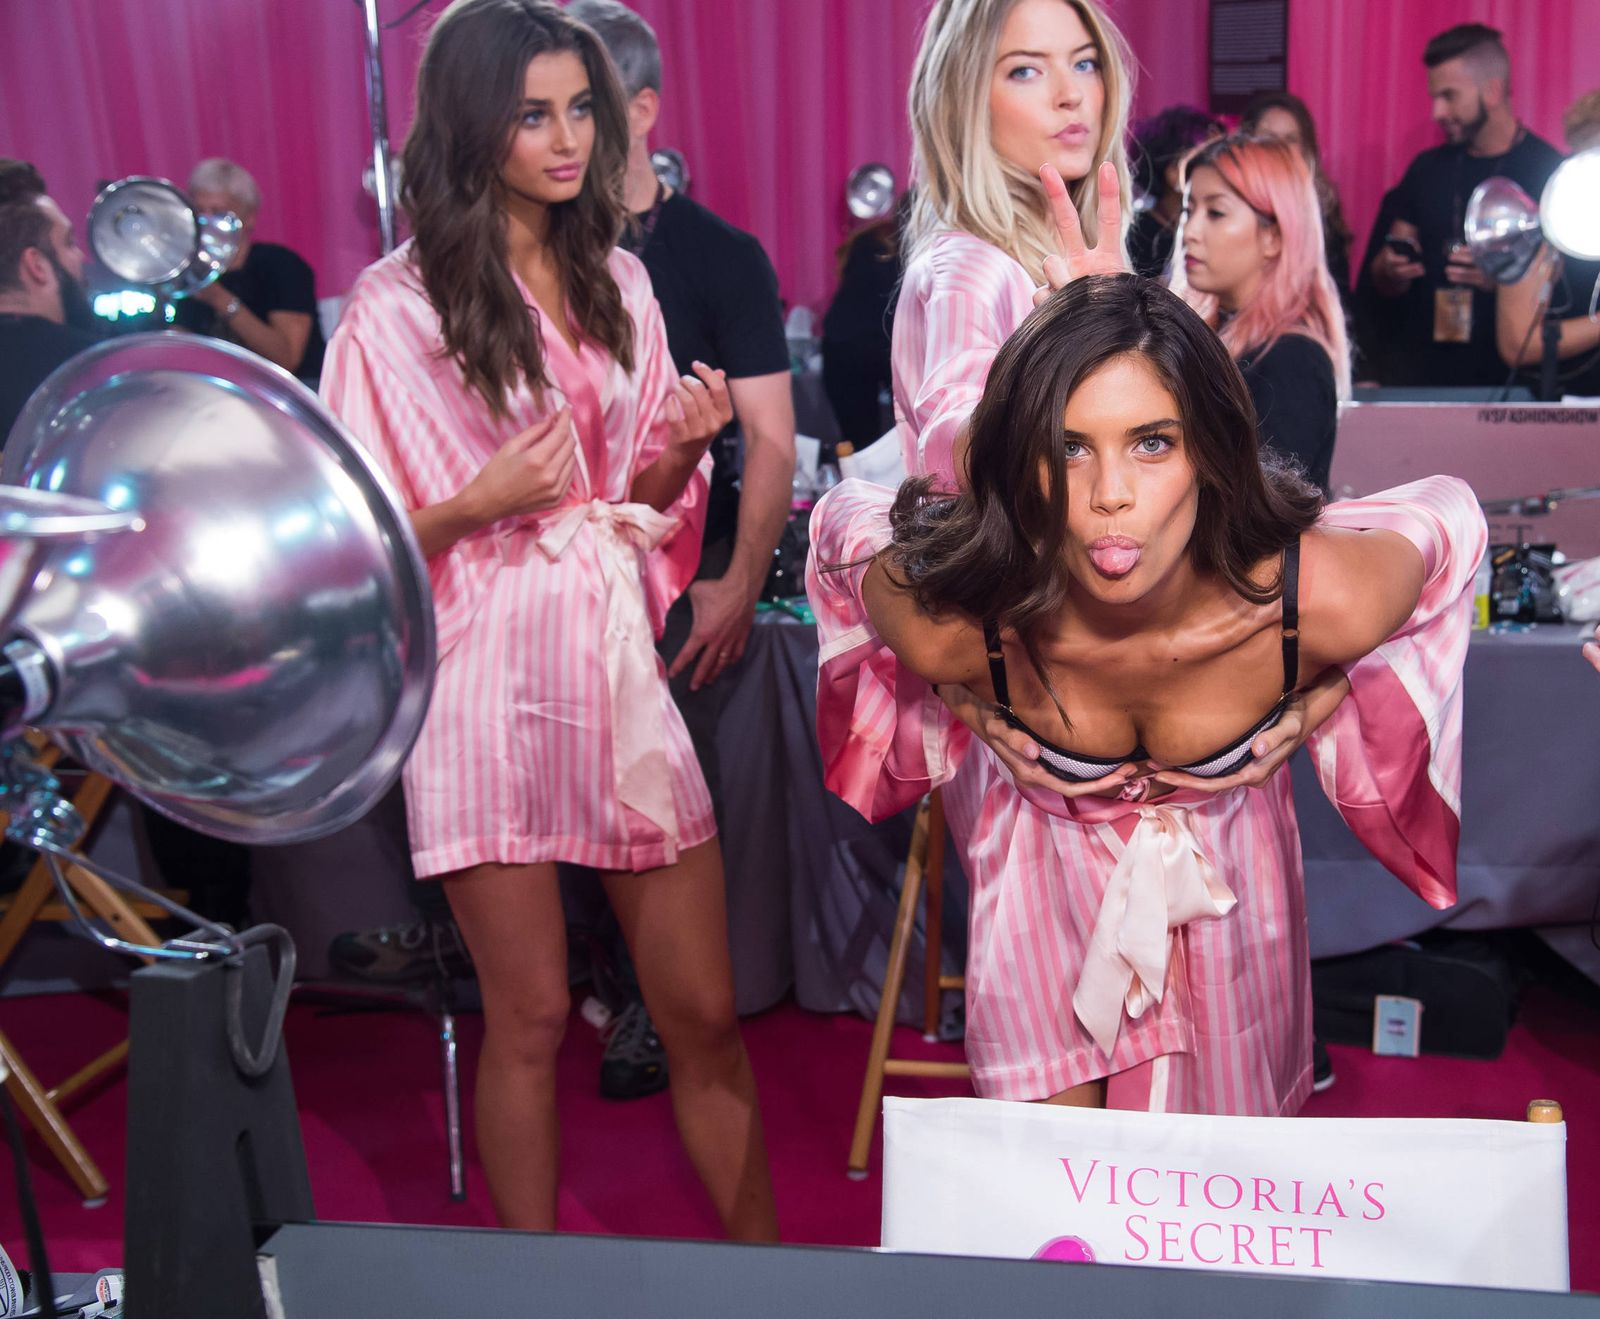 Victoria Secret: Los 20 requisitos de Victorias Secret para ascender ...